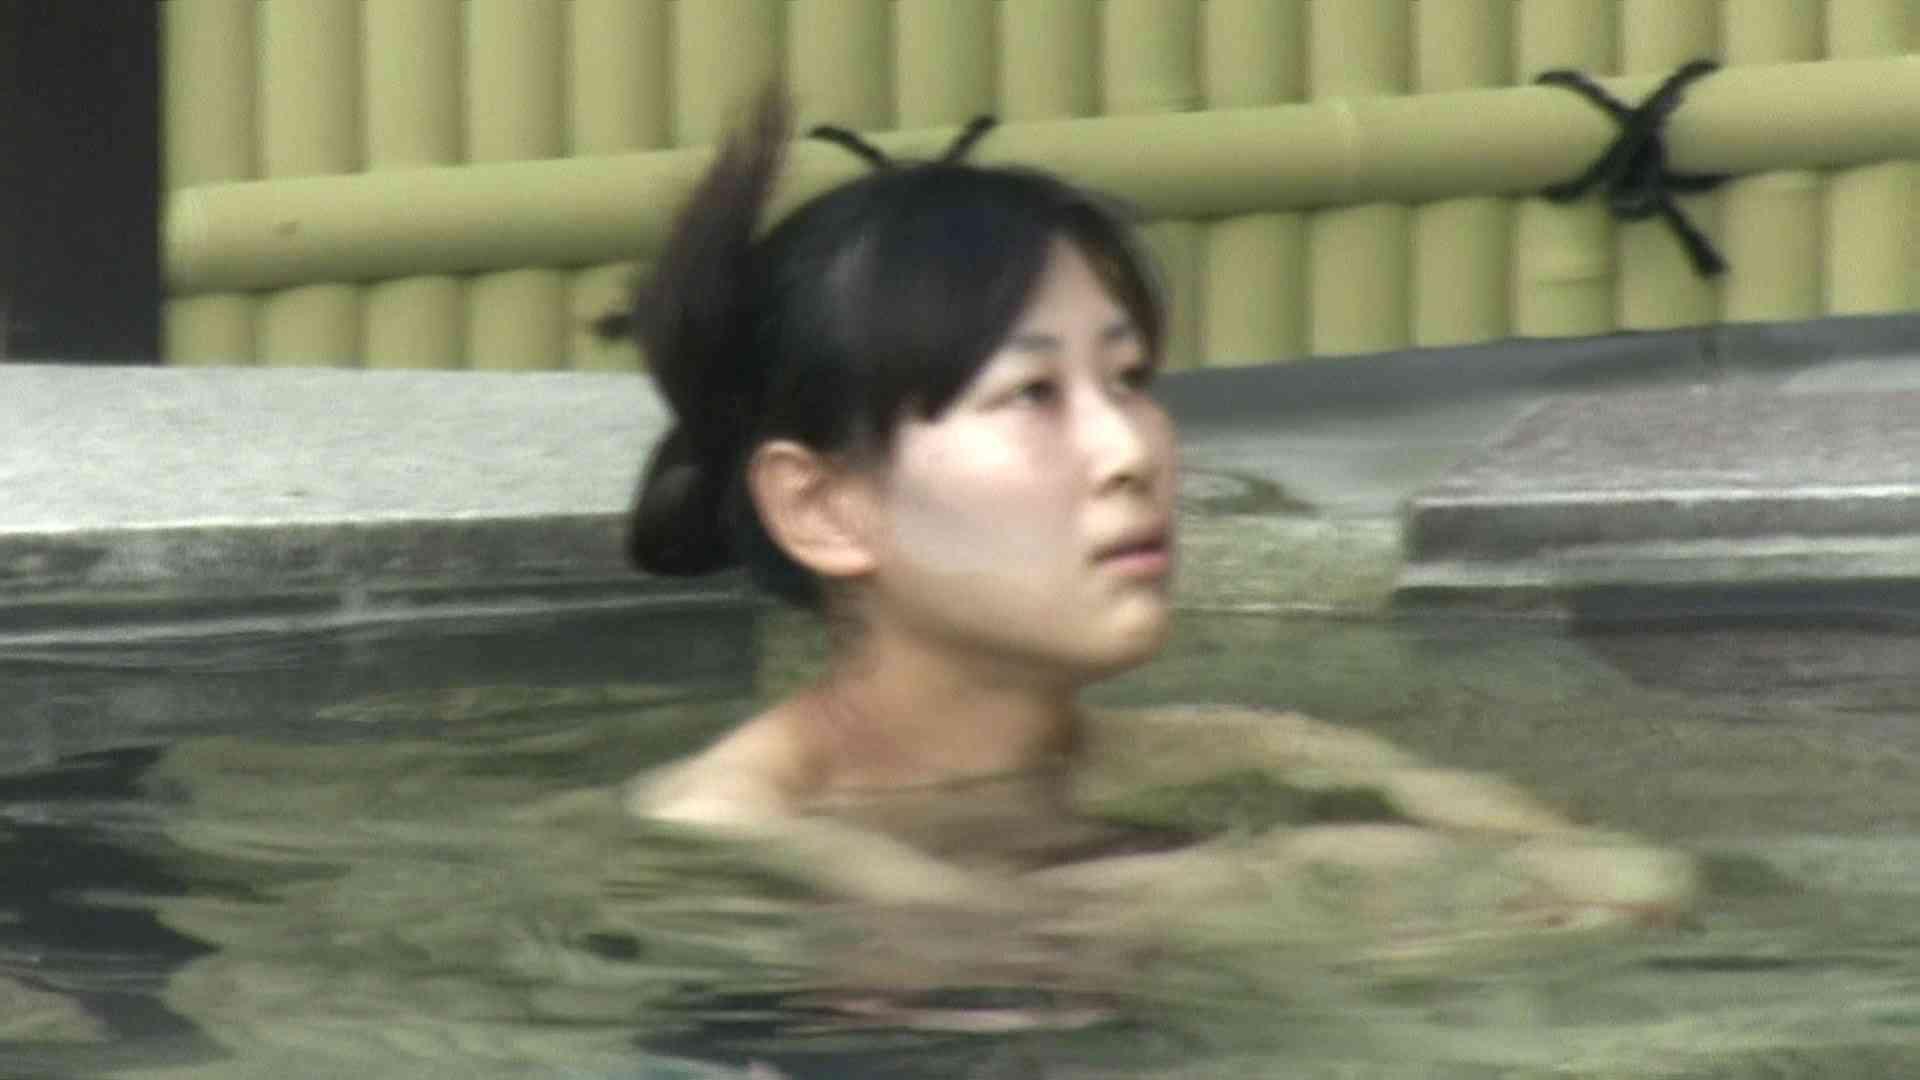 Aquaな露天風呂Vol.665 露天風呂編   盗撮シリーズ  86PIX 27